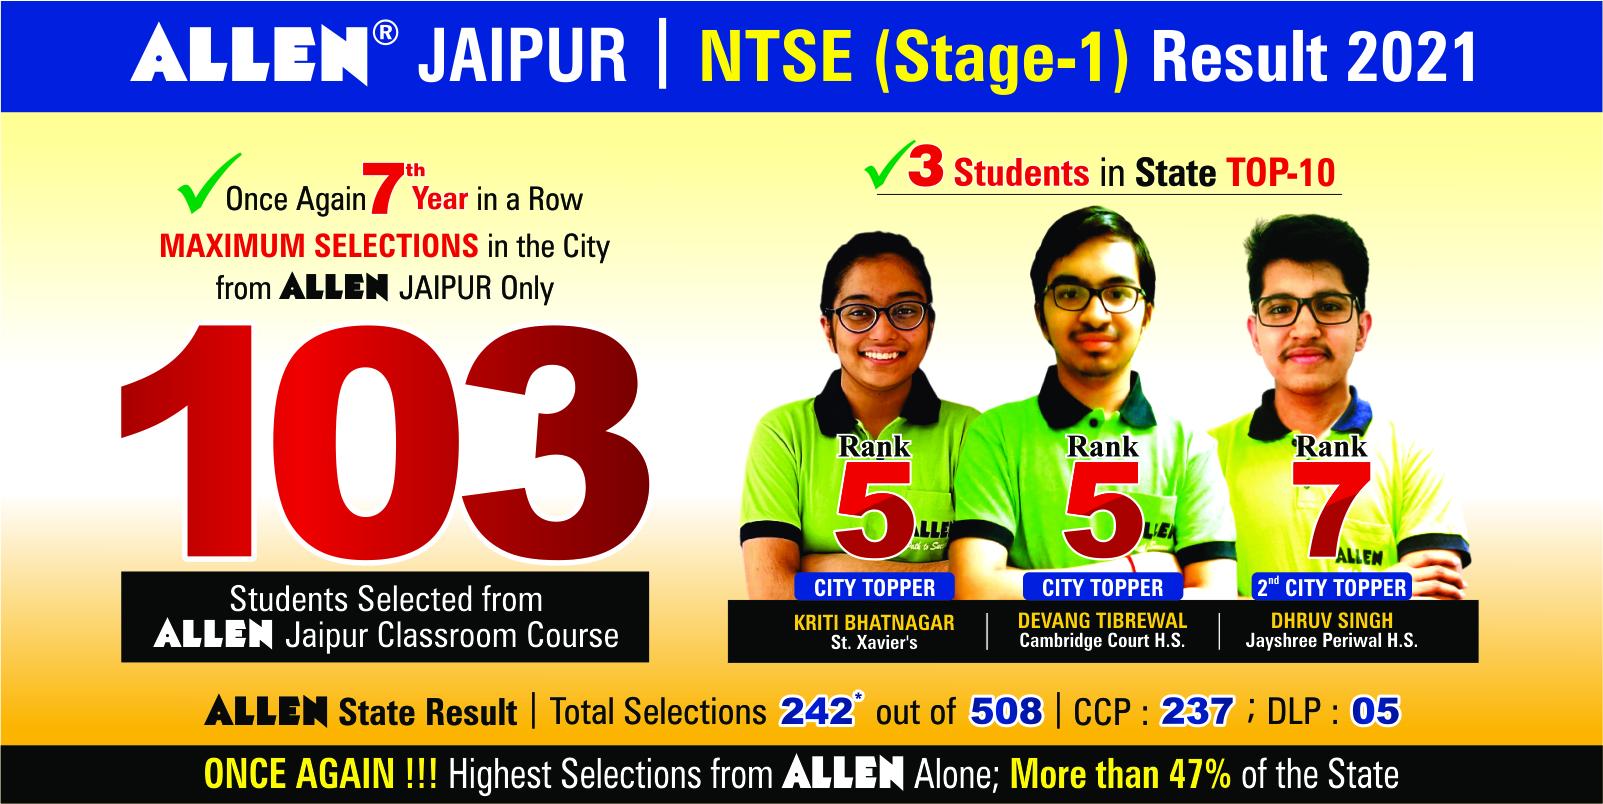 NTSE STAGE-1 Result 2021_20June